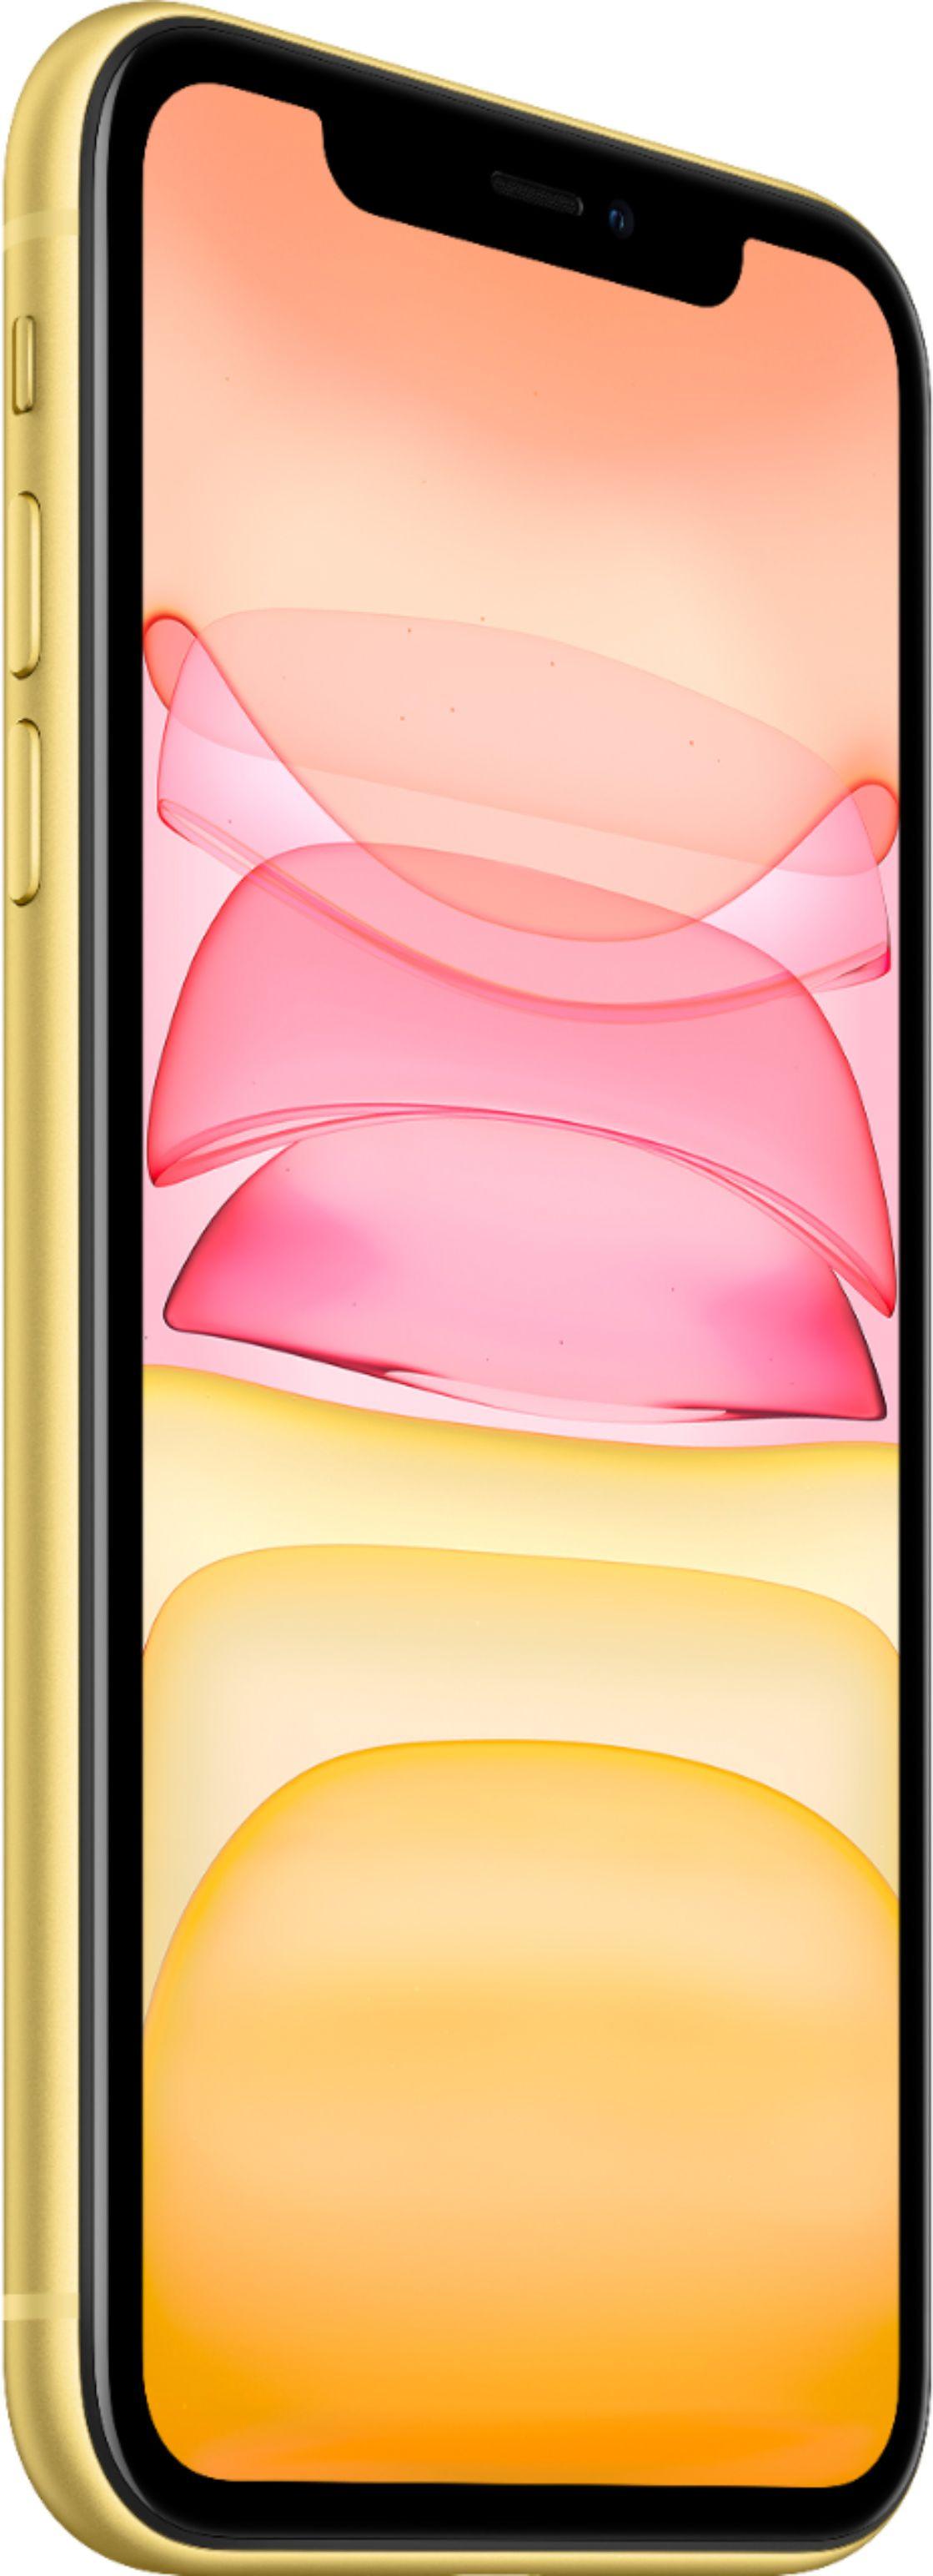 thumbnail 19 - Apple iPhone 11 64GB Factory Unlocked 4G LTE Smartphone